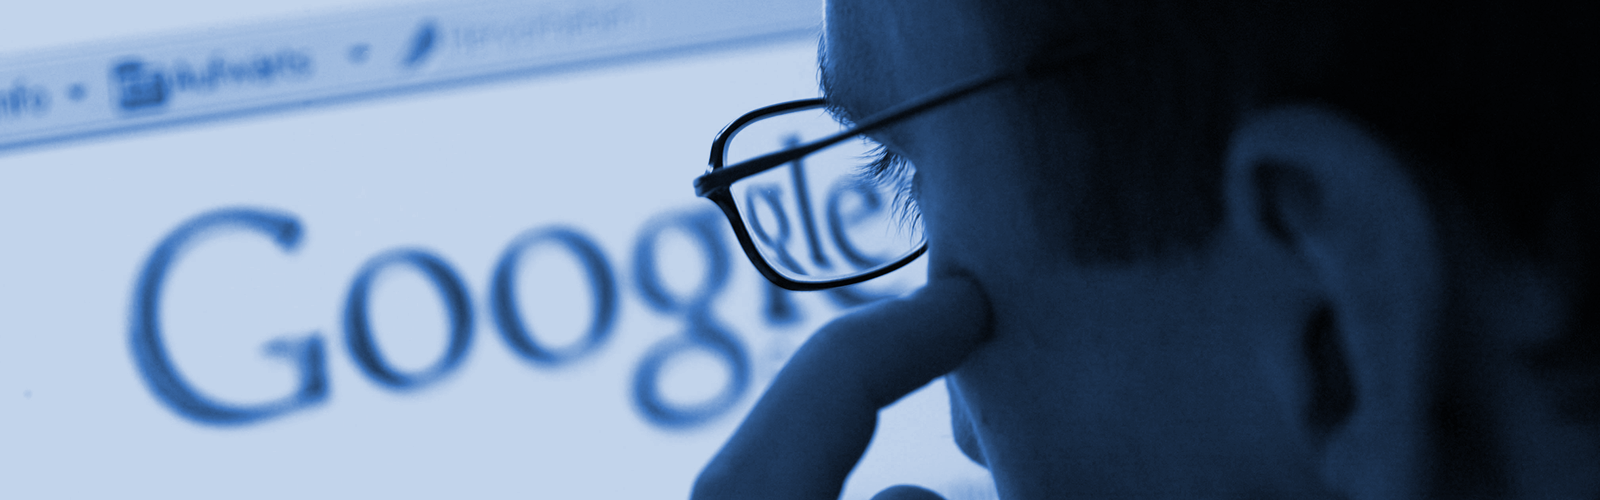 FtGoogle